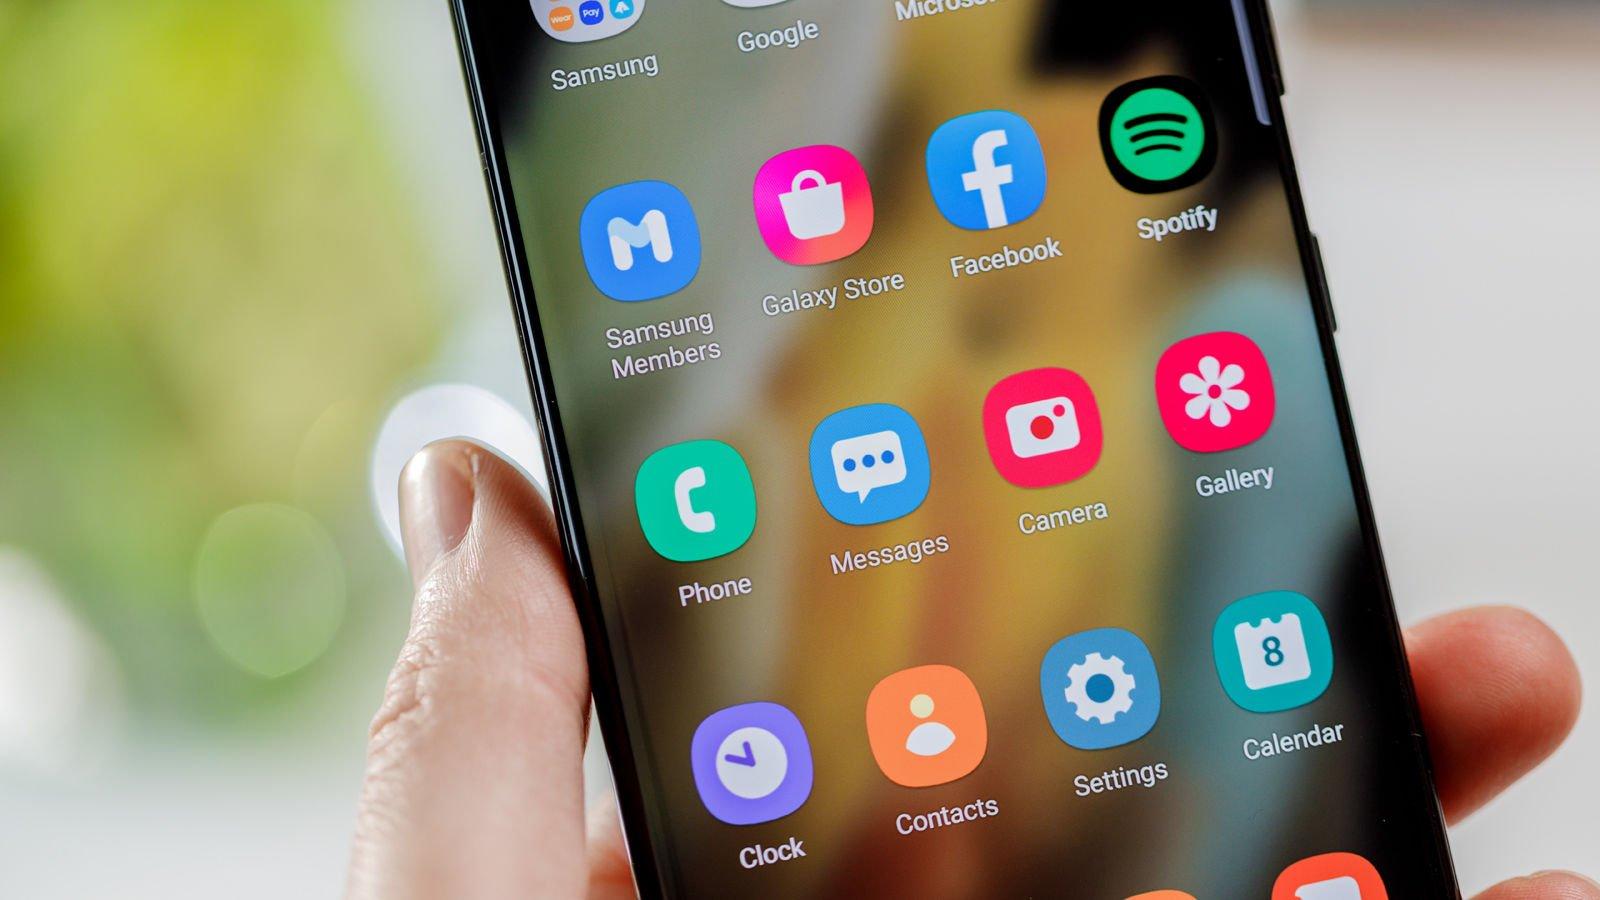 Samsung Galaxy S21 Ultra One UI